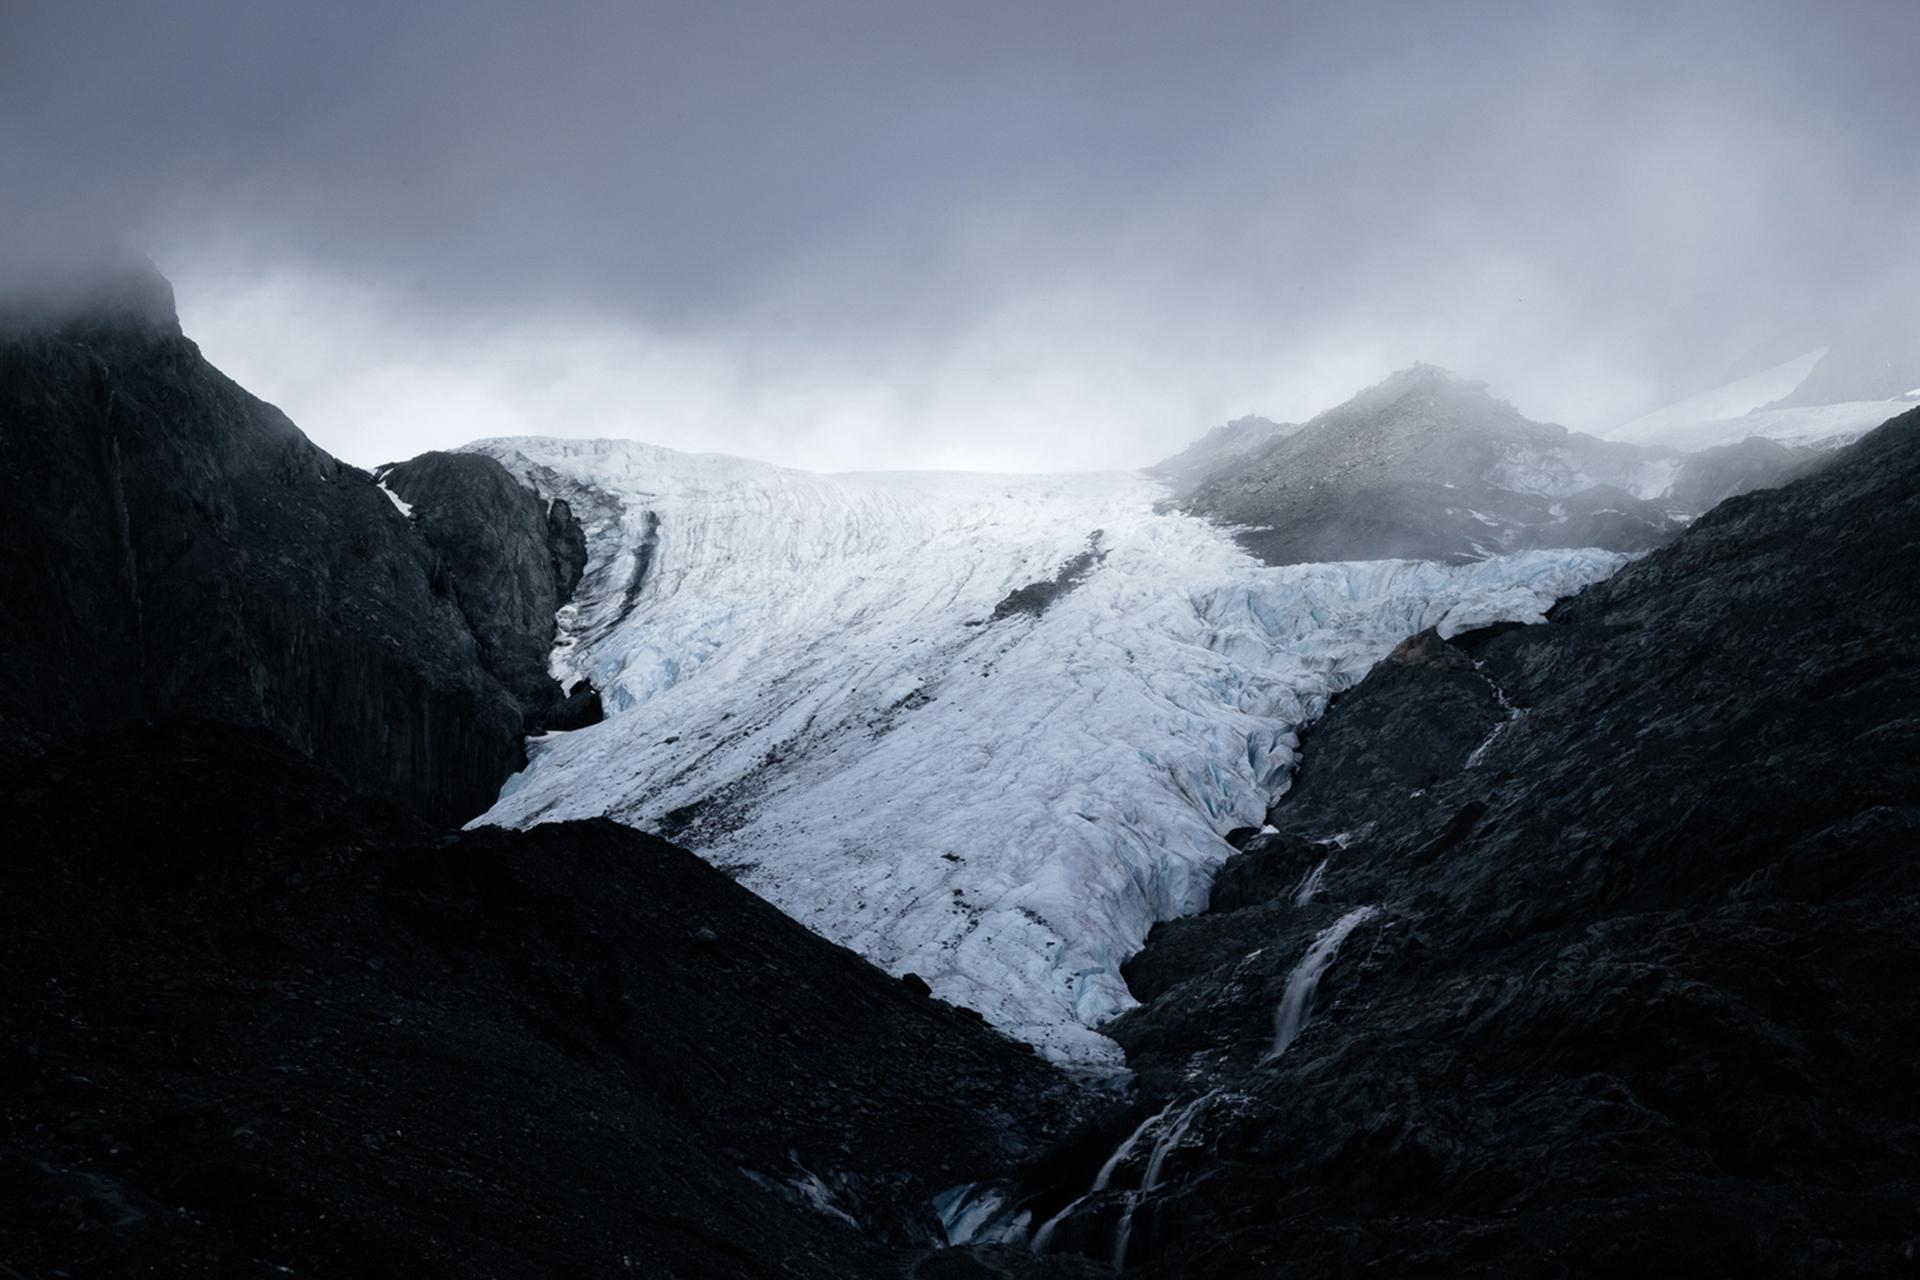 Temprano en la mañana frente al glaciar Worthington, cerca de Valdez, 3 de julio de 2016